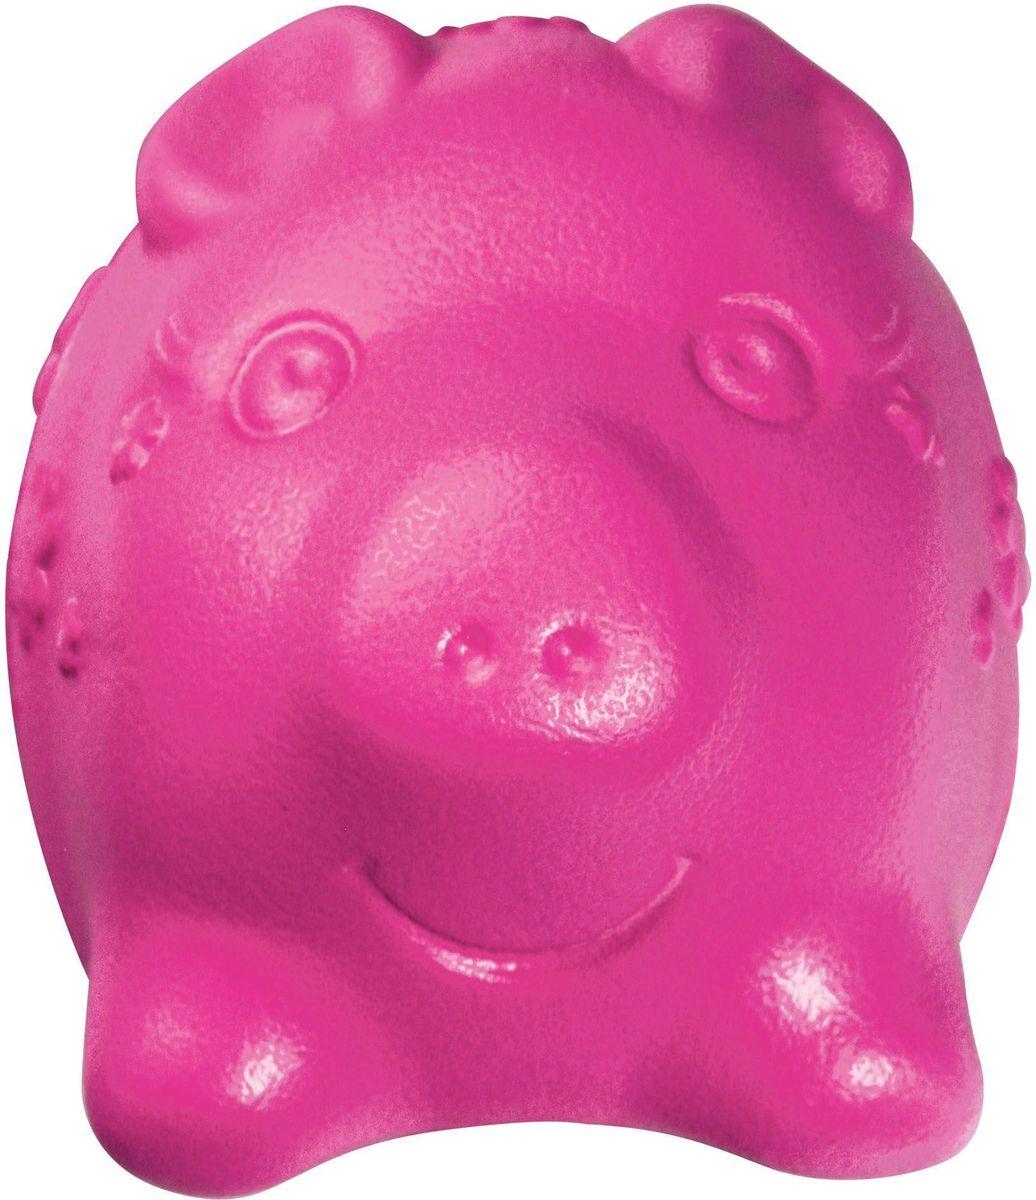 Игрушка для собак Kong  Tuff 'N Lite , свинка, 11 x 8 см - Игрушки